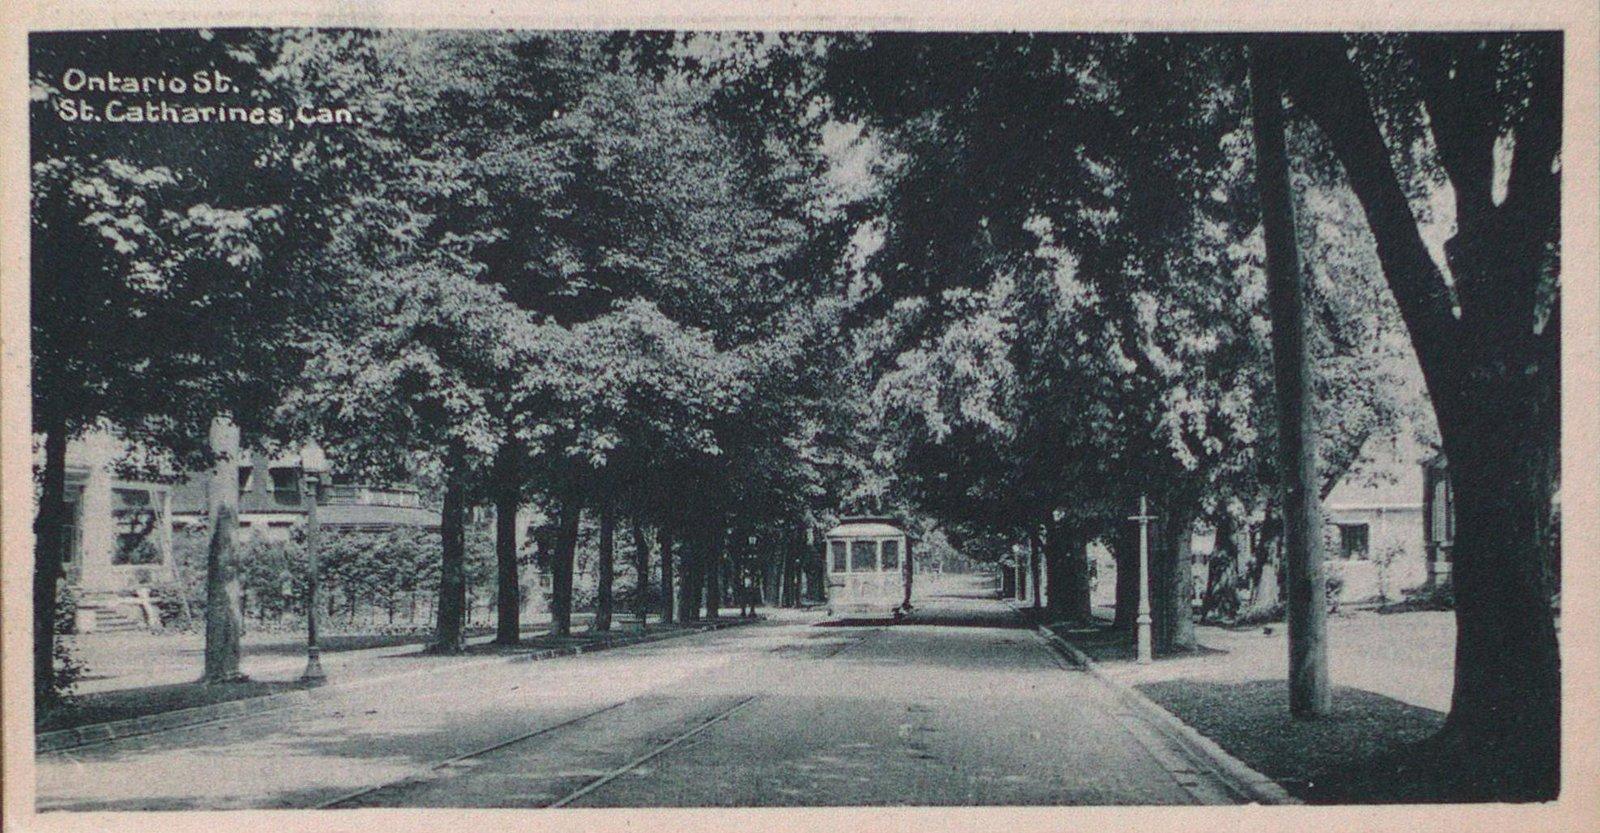 Souvenir of St. Catharines Postcards: Ontario Street